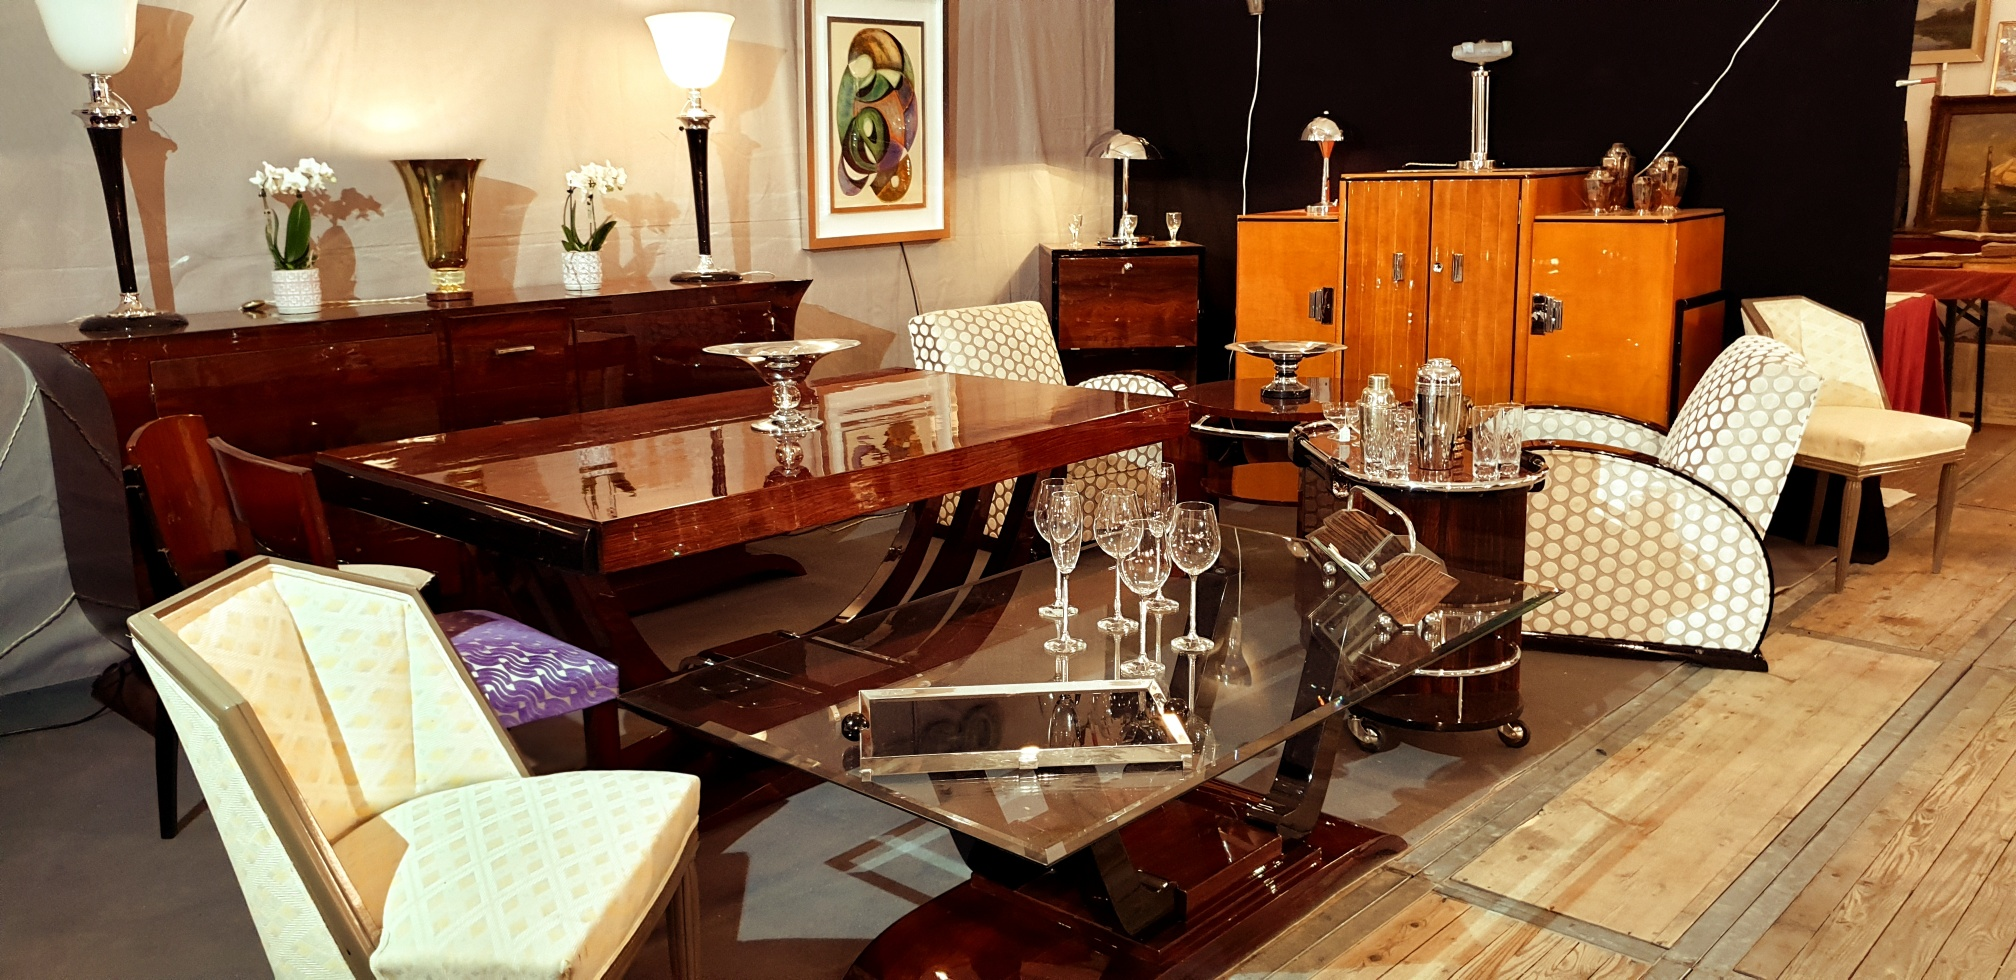 Esprit Art Deco Com esprit art déco vente meubles art déco 1930, bauhaus art